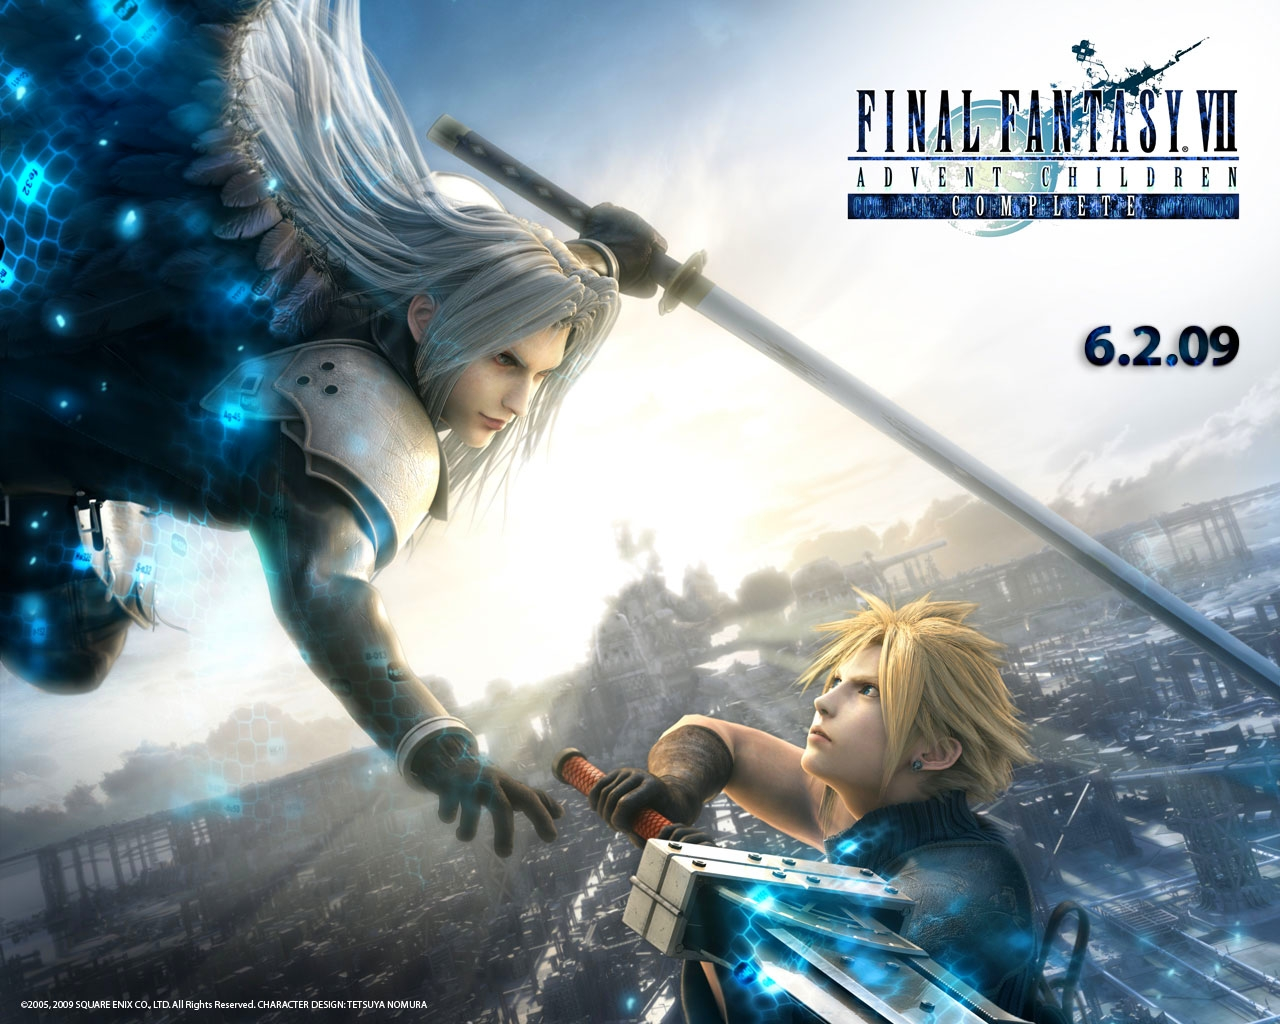 http://4.bp.blogspot.com/-qxZ_Ei6DvY0/UAUhK4M6qZI/AAAAAAAABPc/1SSqrZj5MXw/s1600/final+fantasy+7+advent+children+complete+vii+ff7+ffvii+cloud+strife+vs